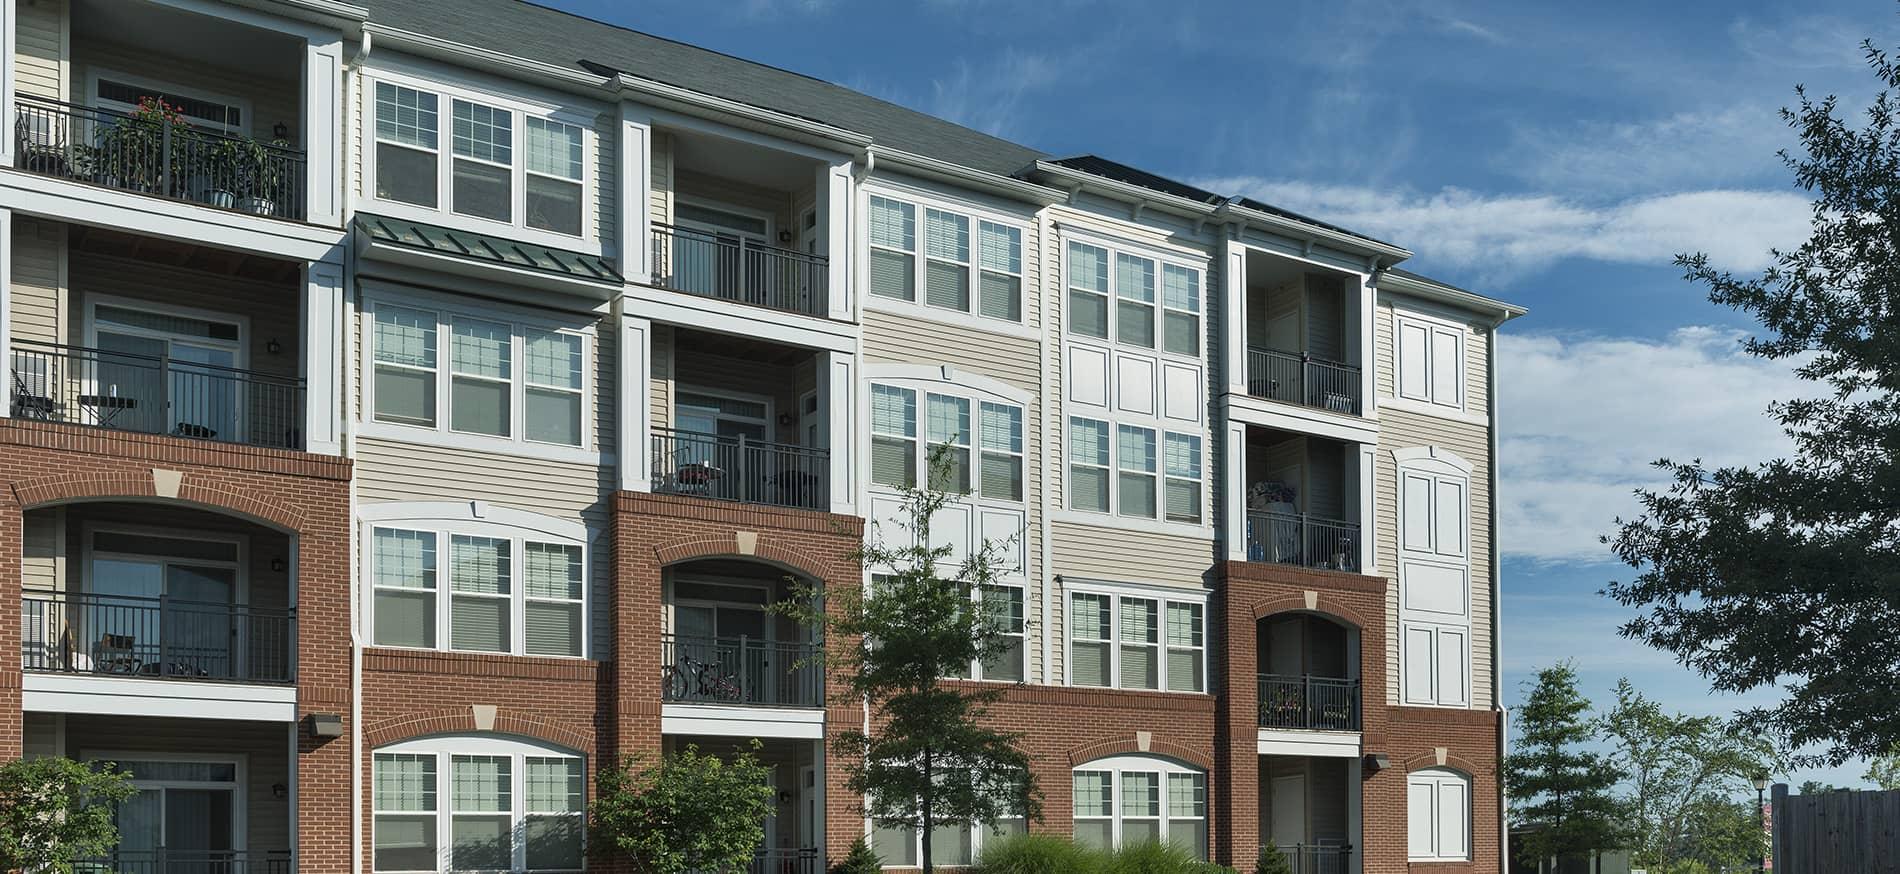 Signal Hill Apartments in Woodbridge VA